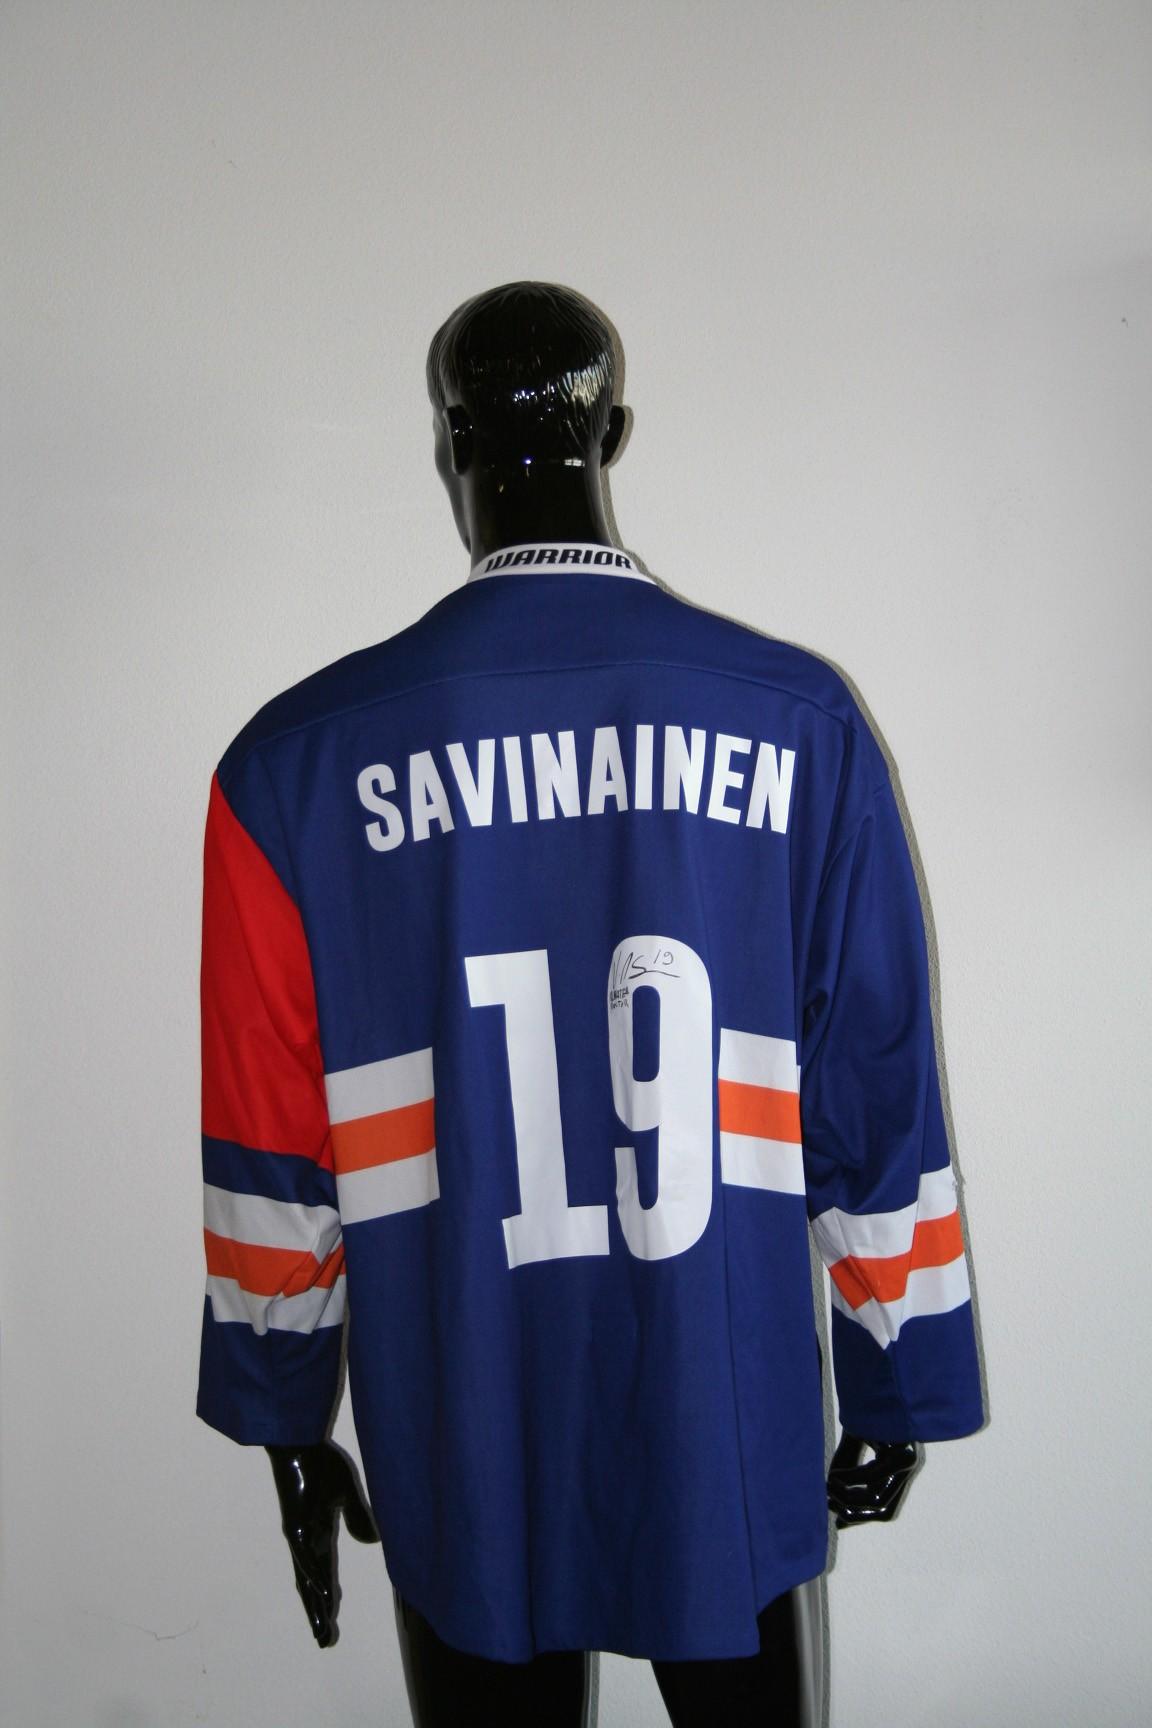 hyvä laatu myynti Yhdysvallat Tappara Tampere - Champions Hockey League Shop powered by ...